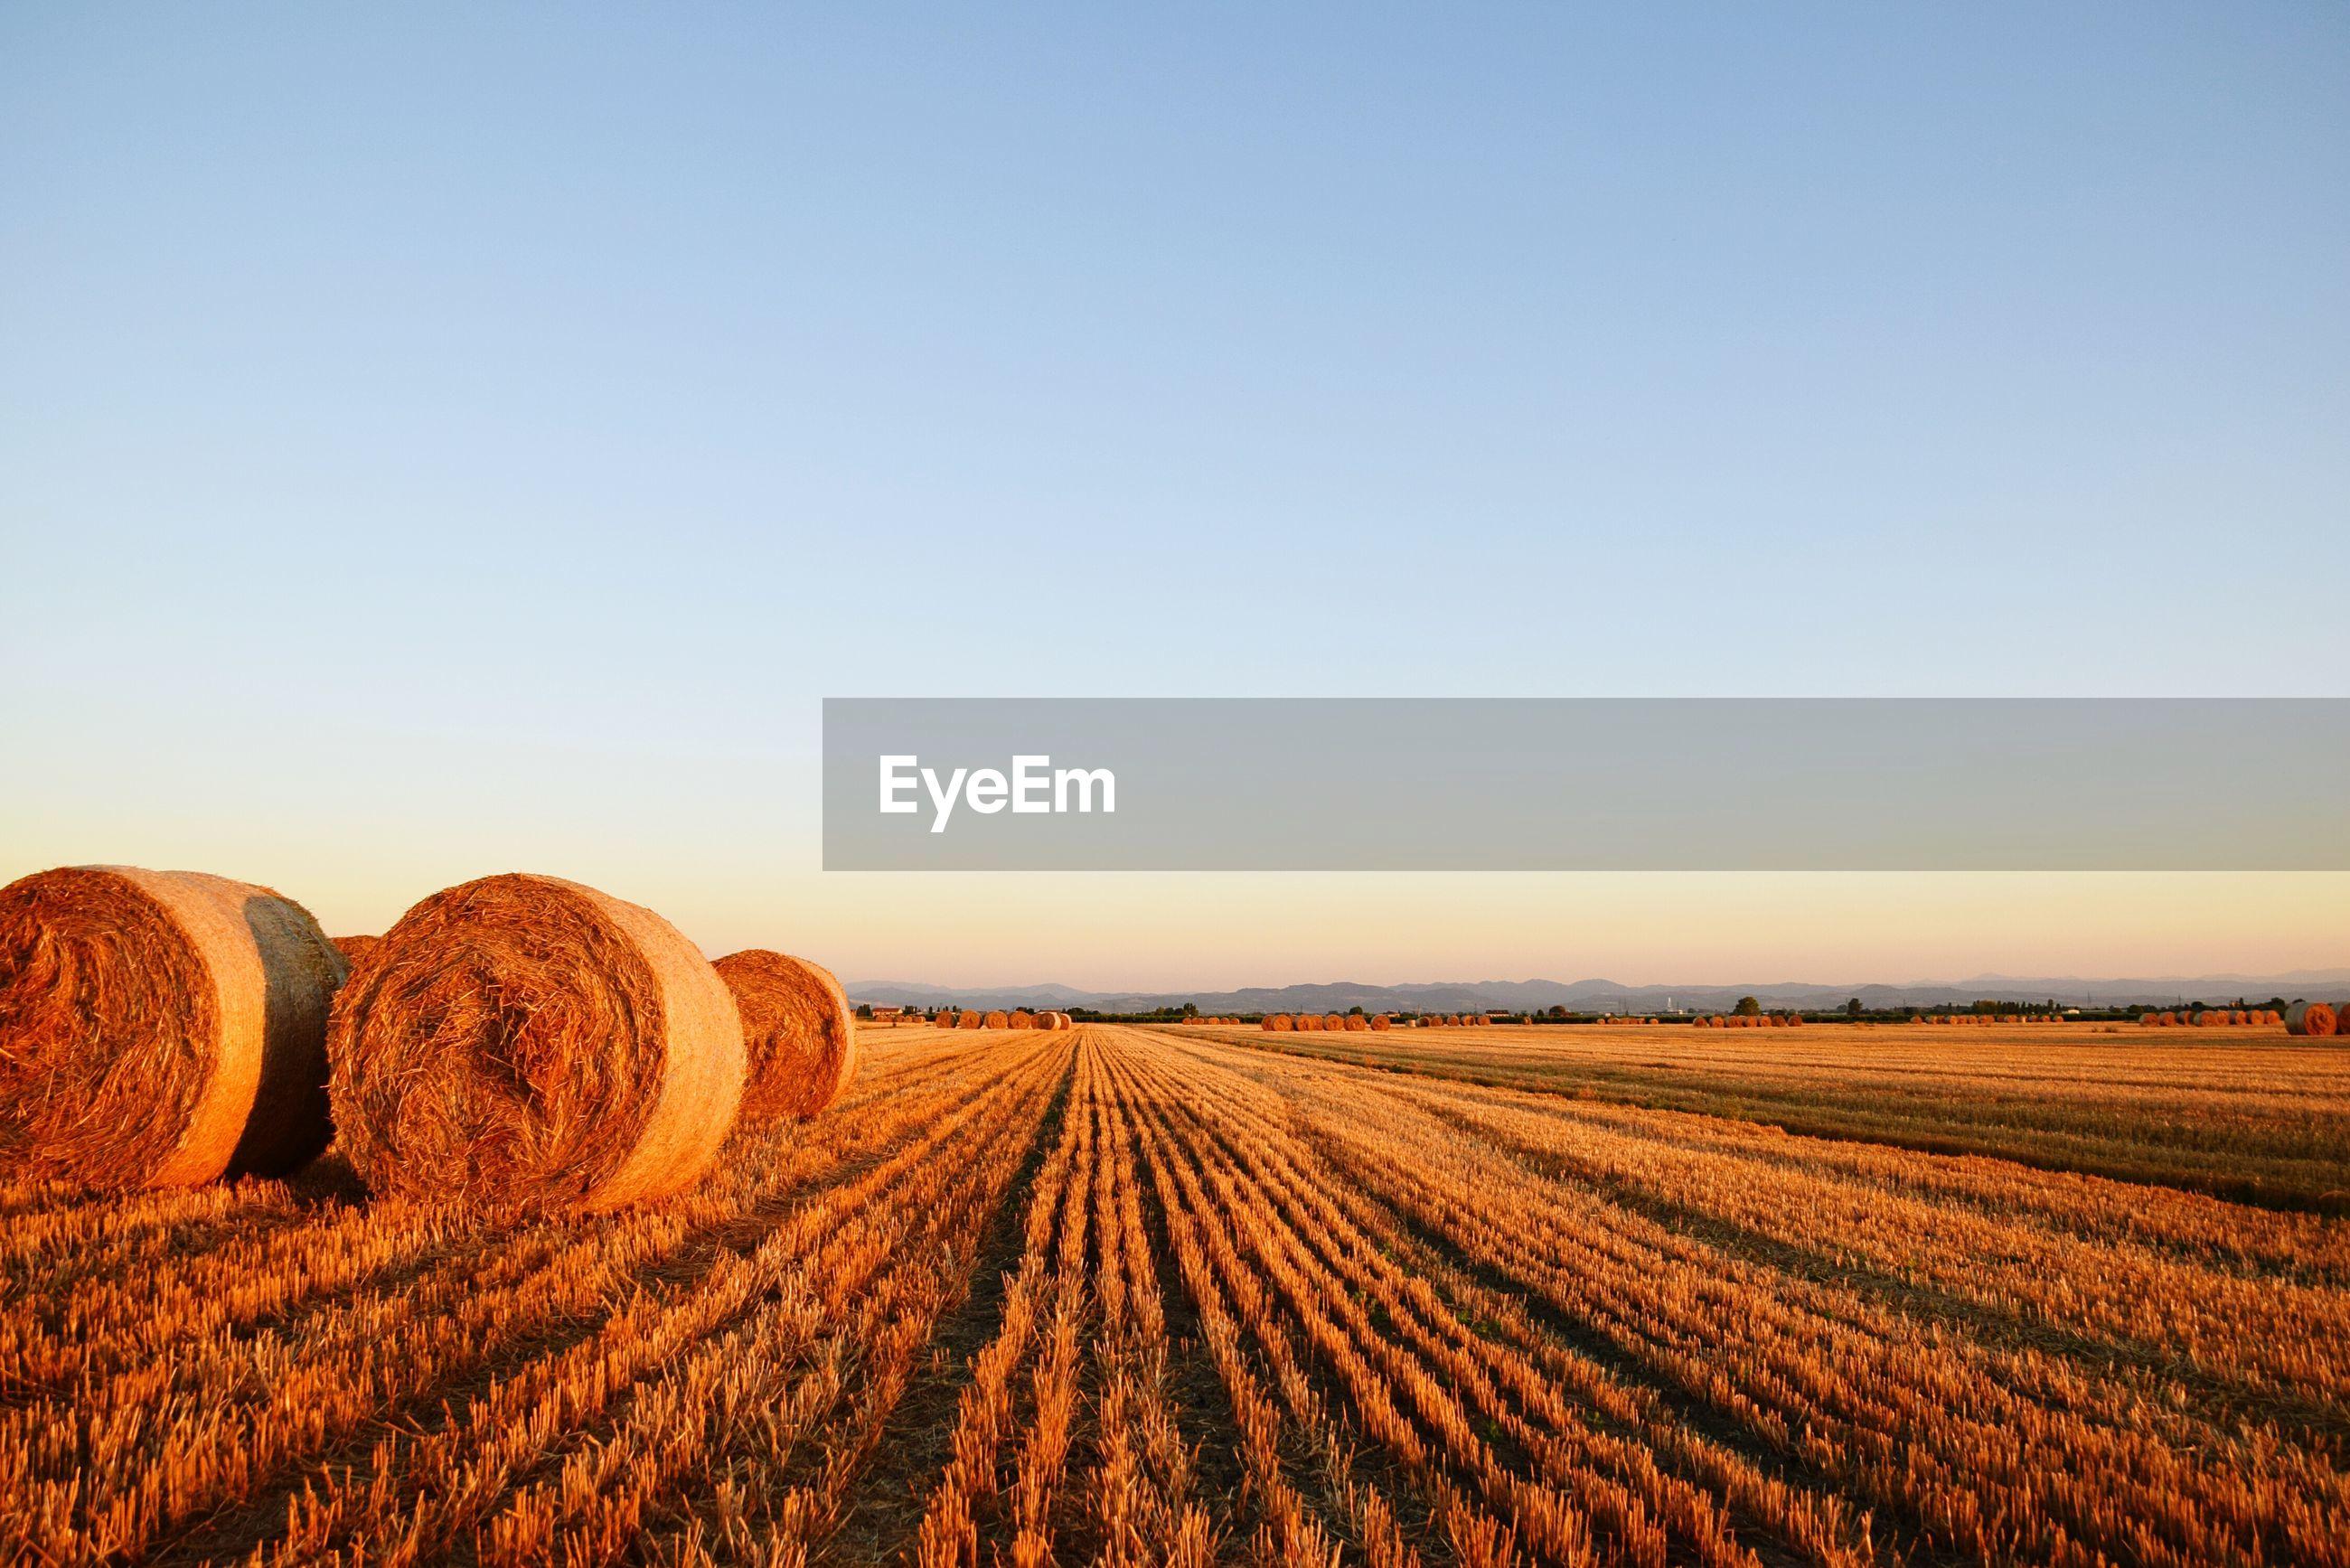 Hay bales on farm against clear sky